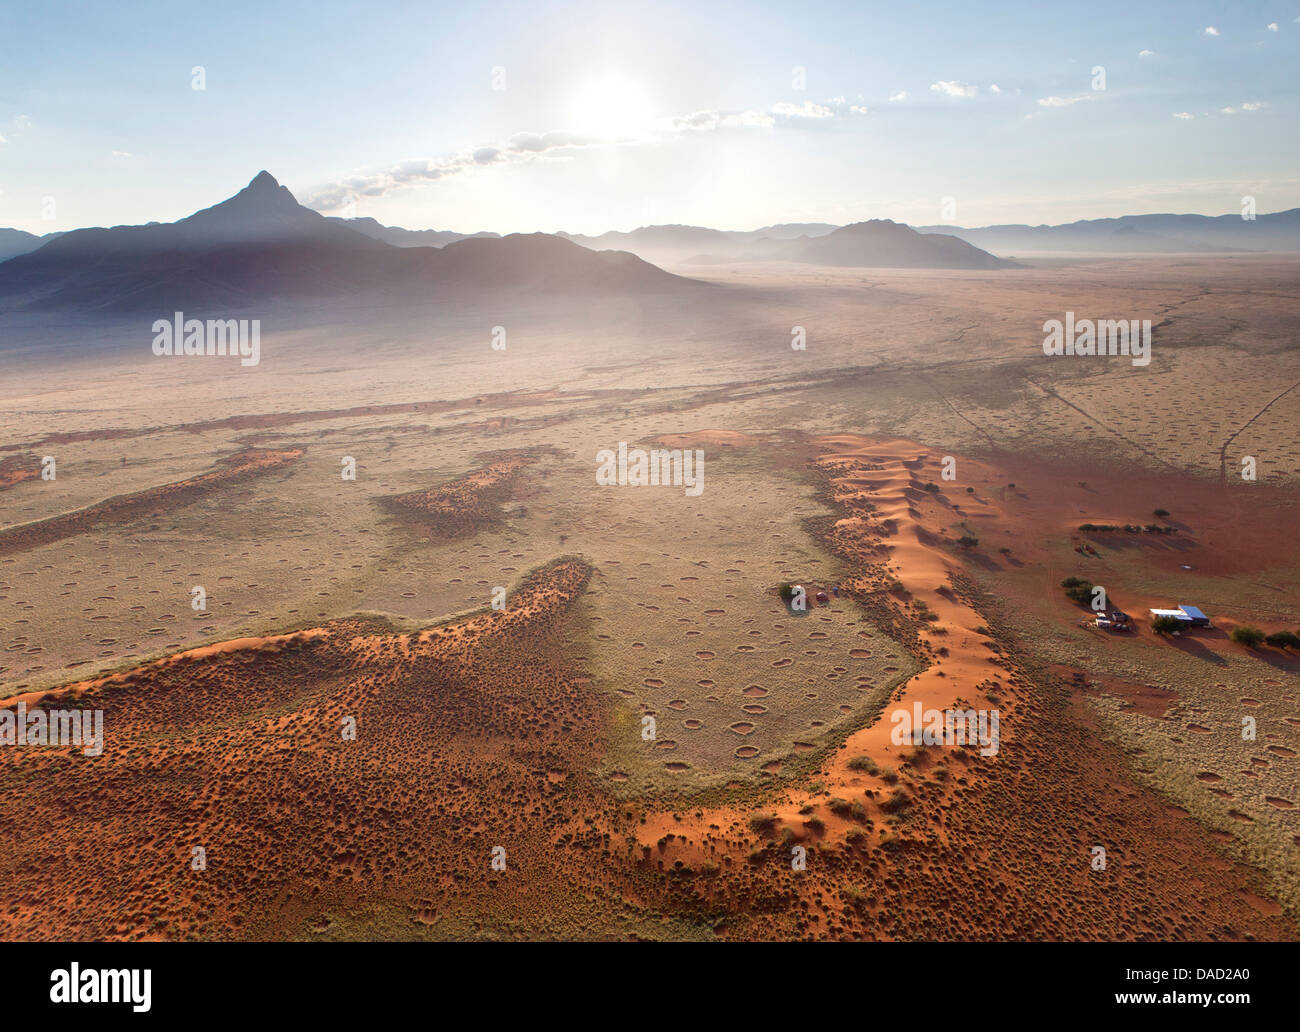 Aerial view from hot air balloon of mountains and Fairy Circles, Namib Rand game reserve Namib Naukluft Park, Namibia - Stock Image